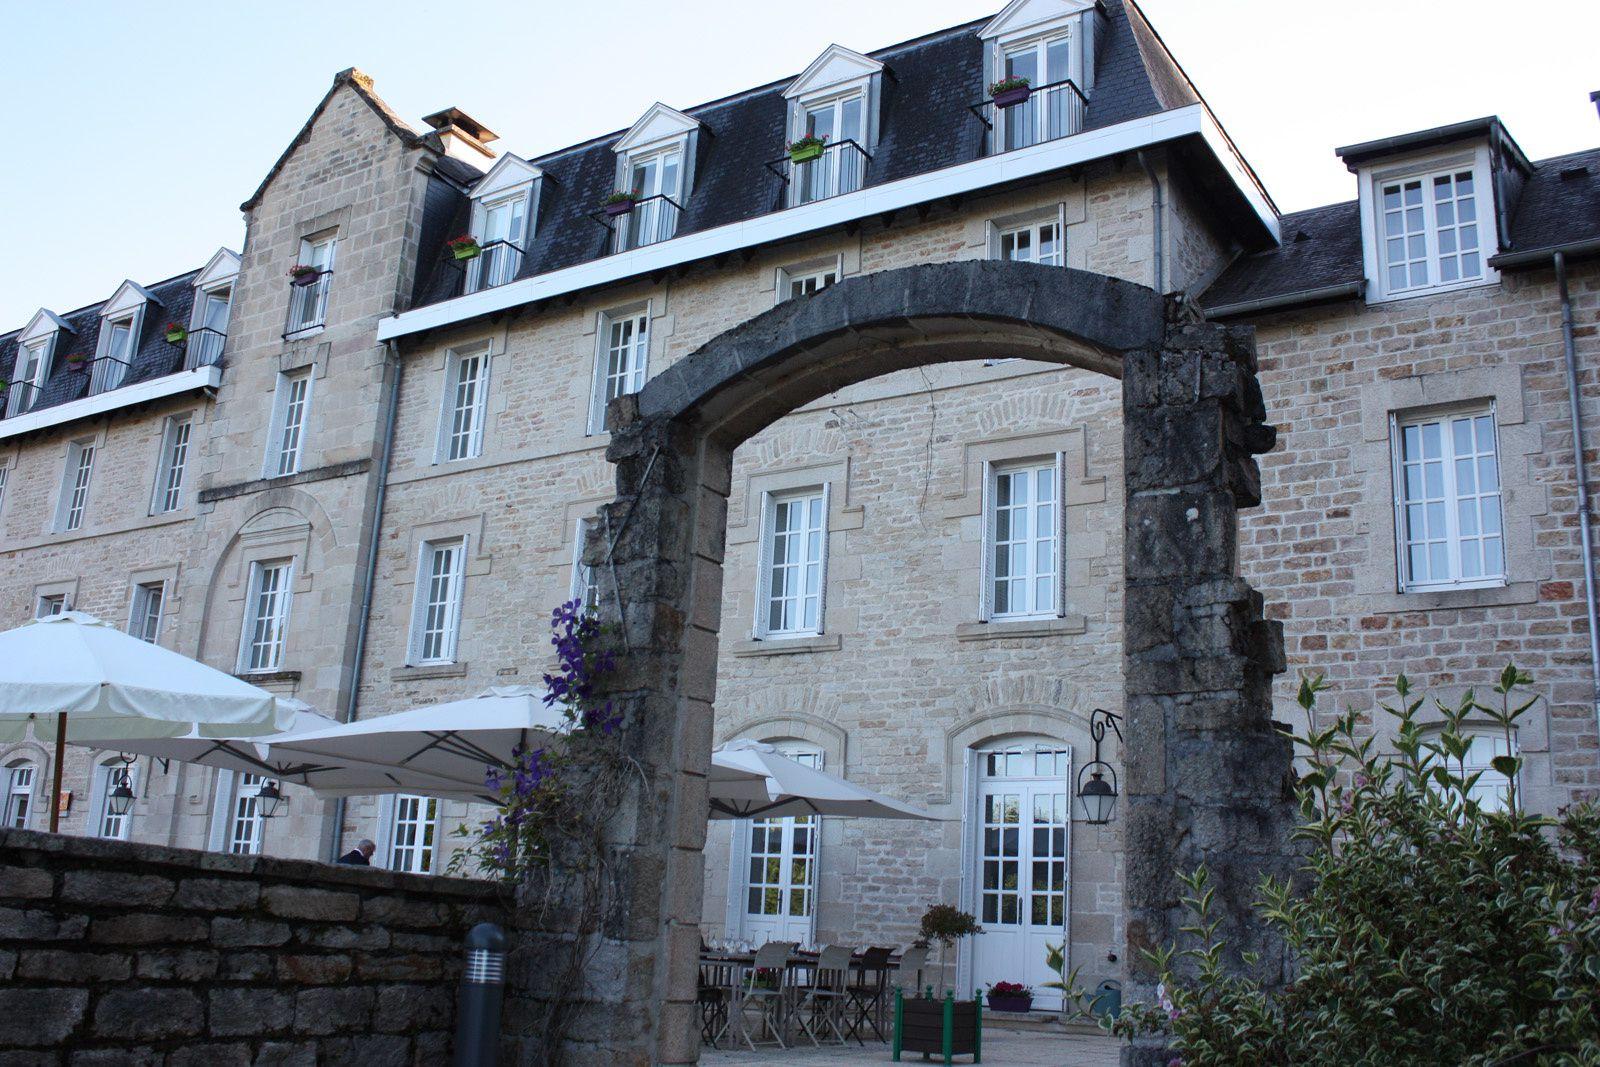 Rallye &quot&#x3B;La Corrèze à vol d'oiseau &amp&#x3B; en zig-zag&quot&#x3B; 2015